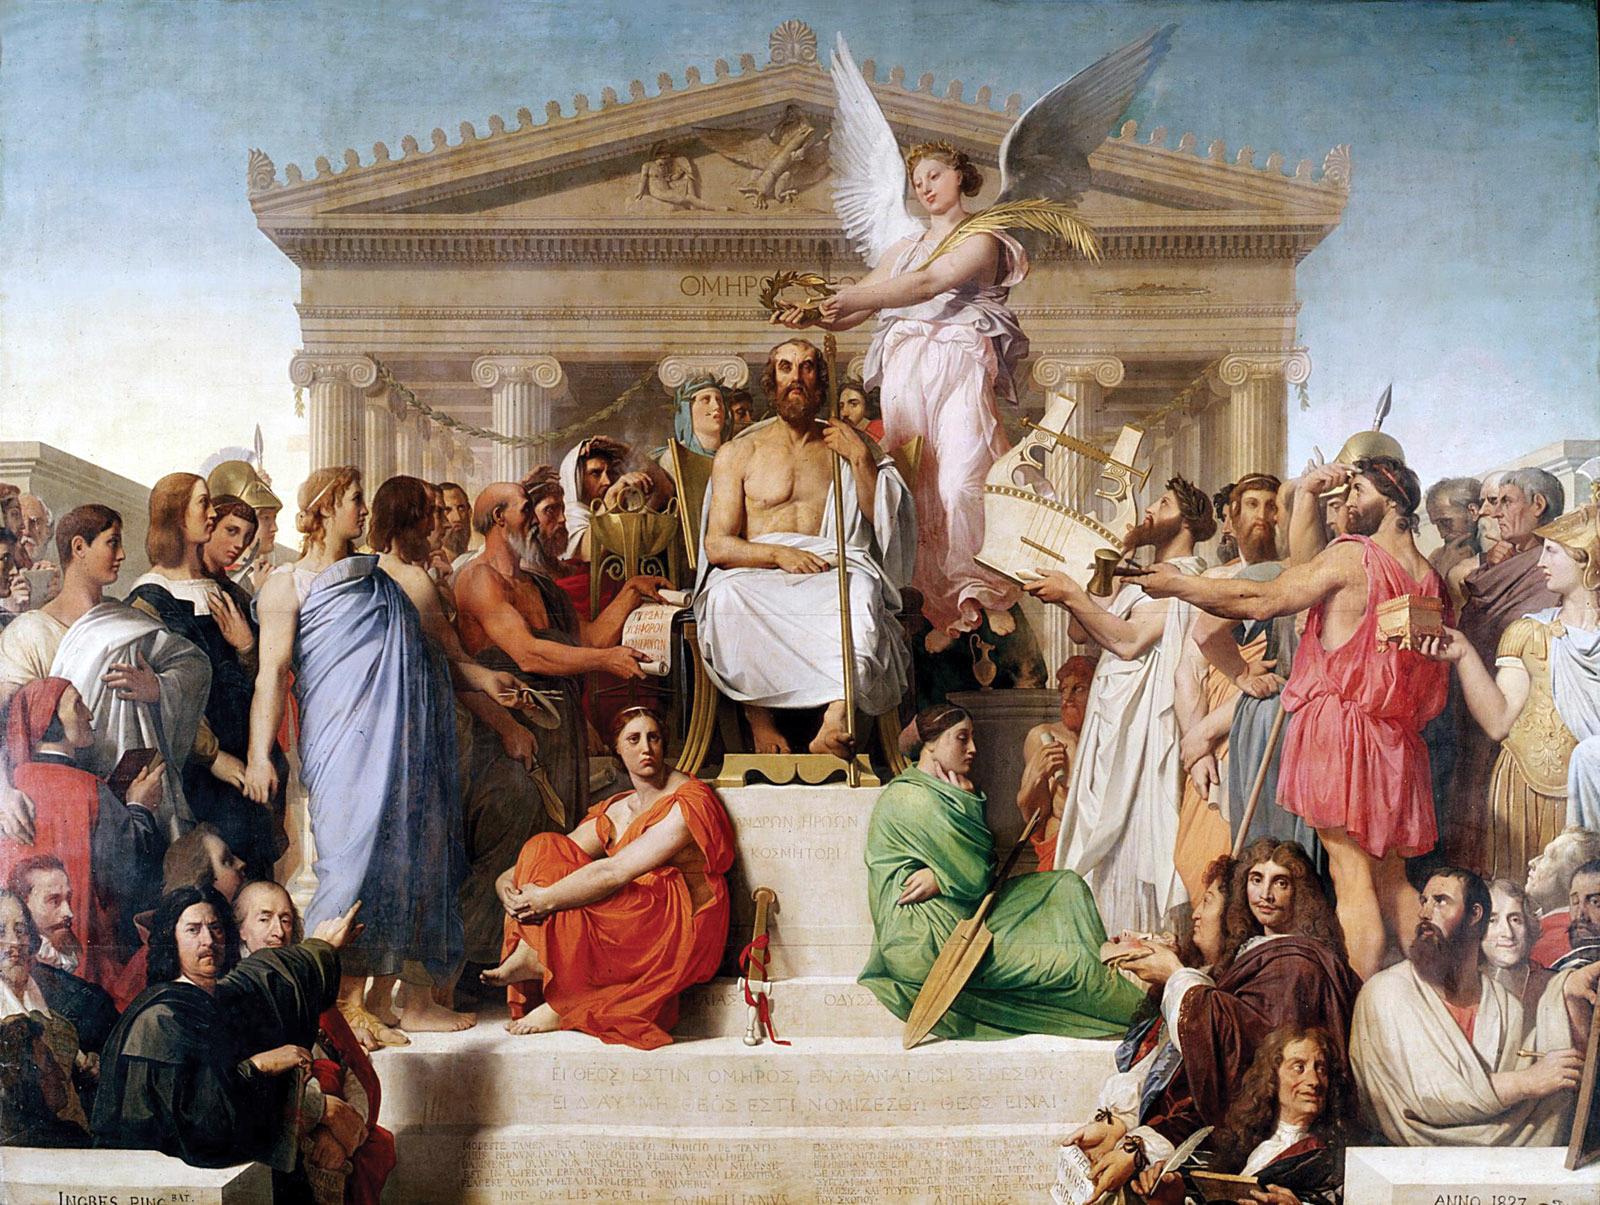 Jean_Auguste_Dominique_Ingres_Apotheosis_of_Homer_1827